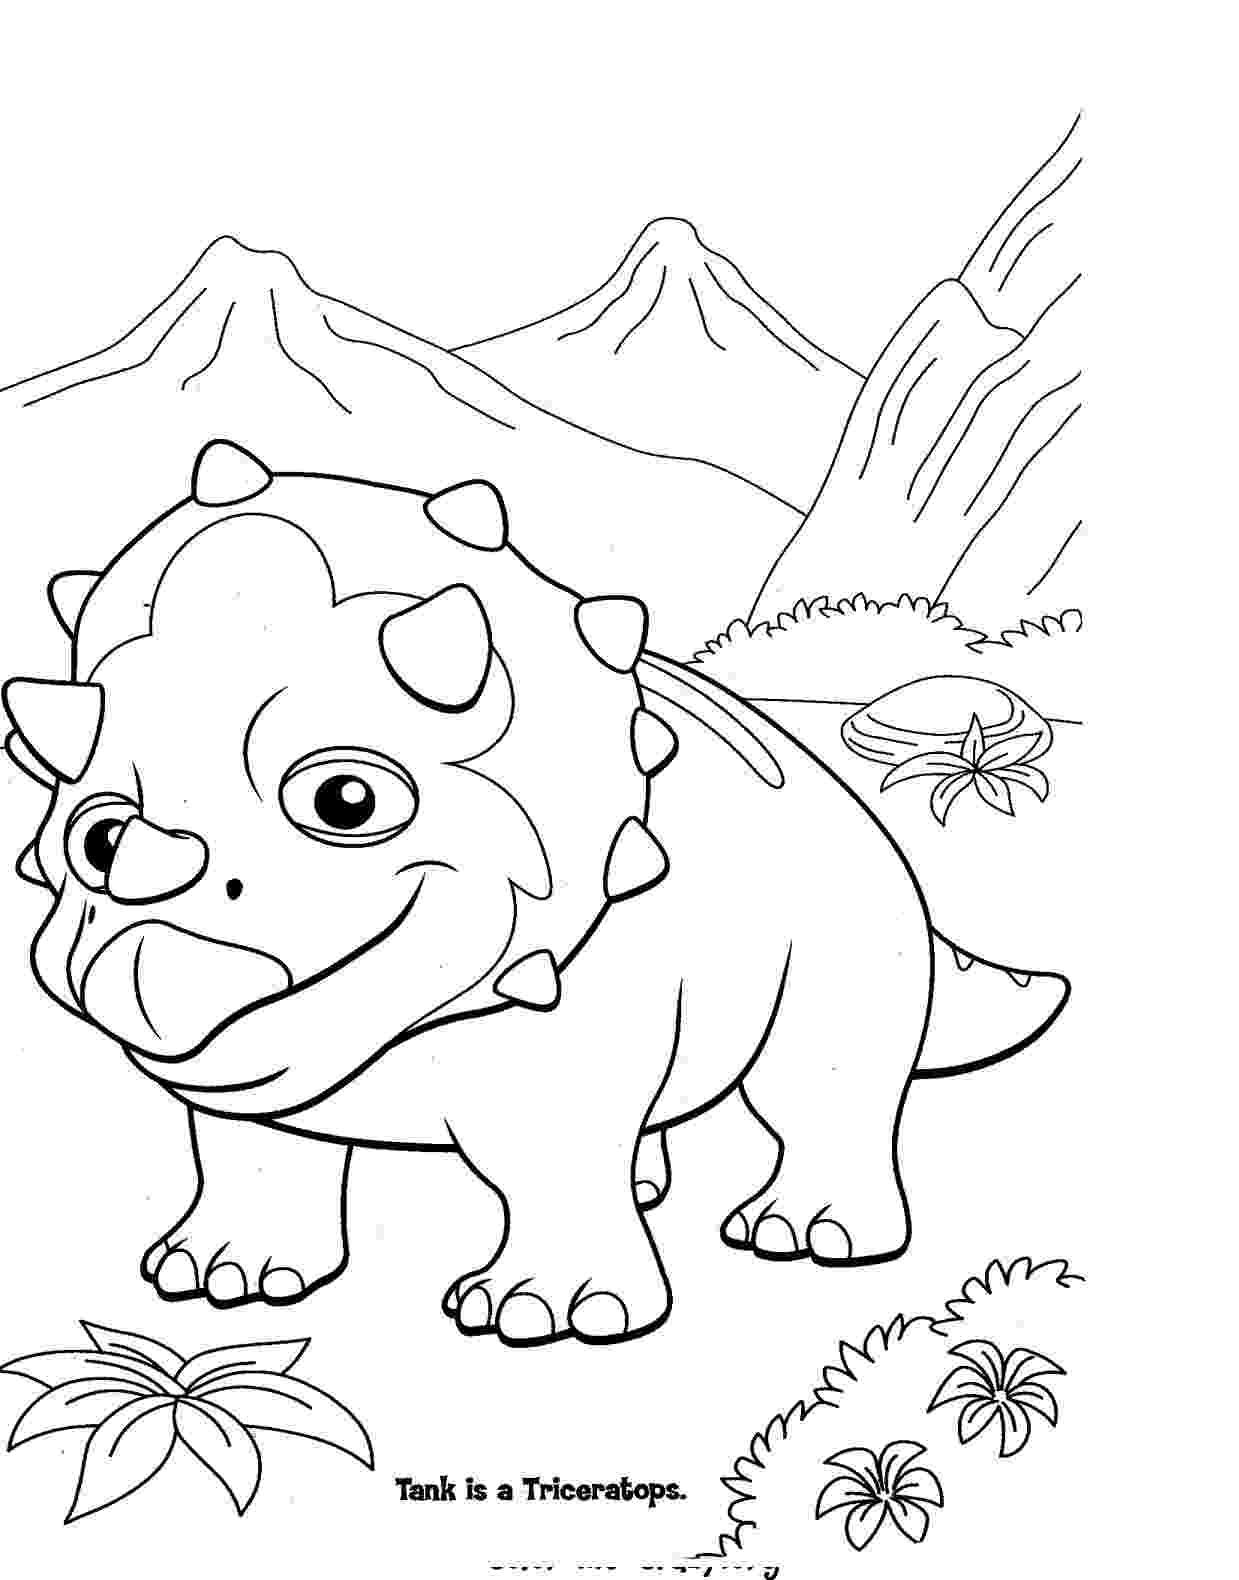 coloring dinosaur pictures cute cartoon dinosaur coloring page free printable coloring pictures dinosaur